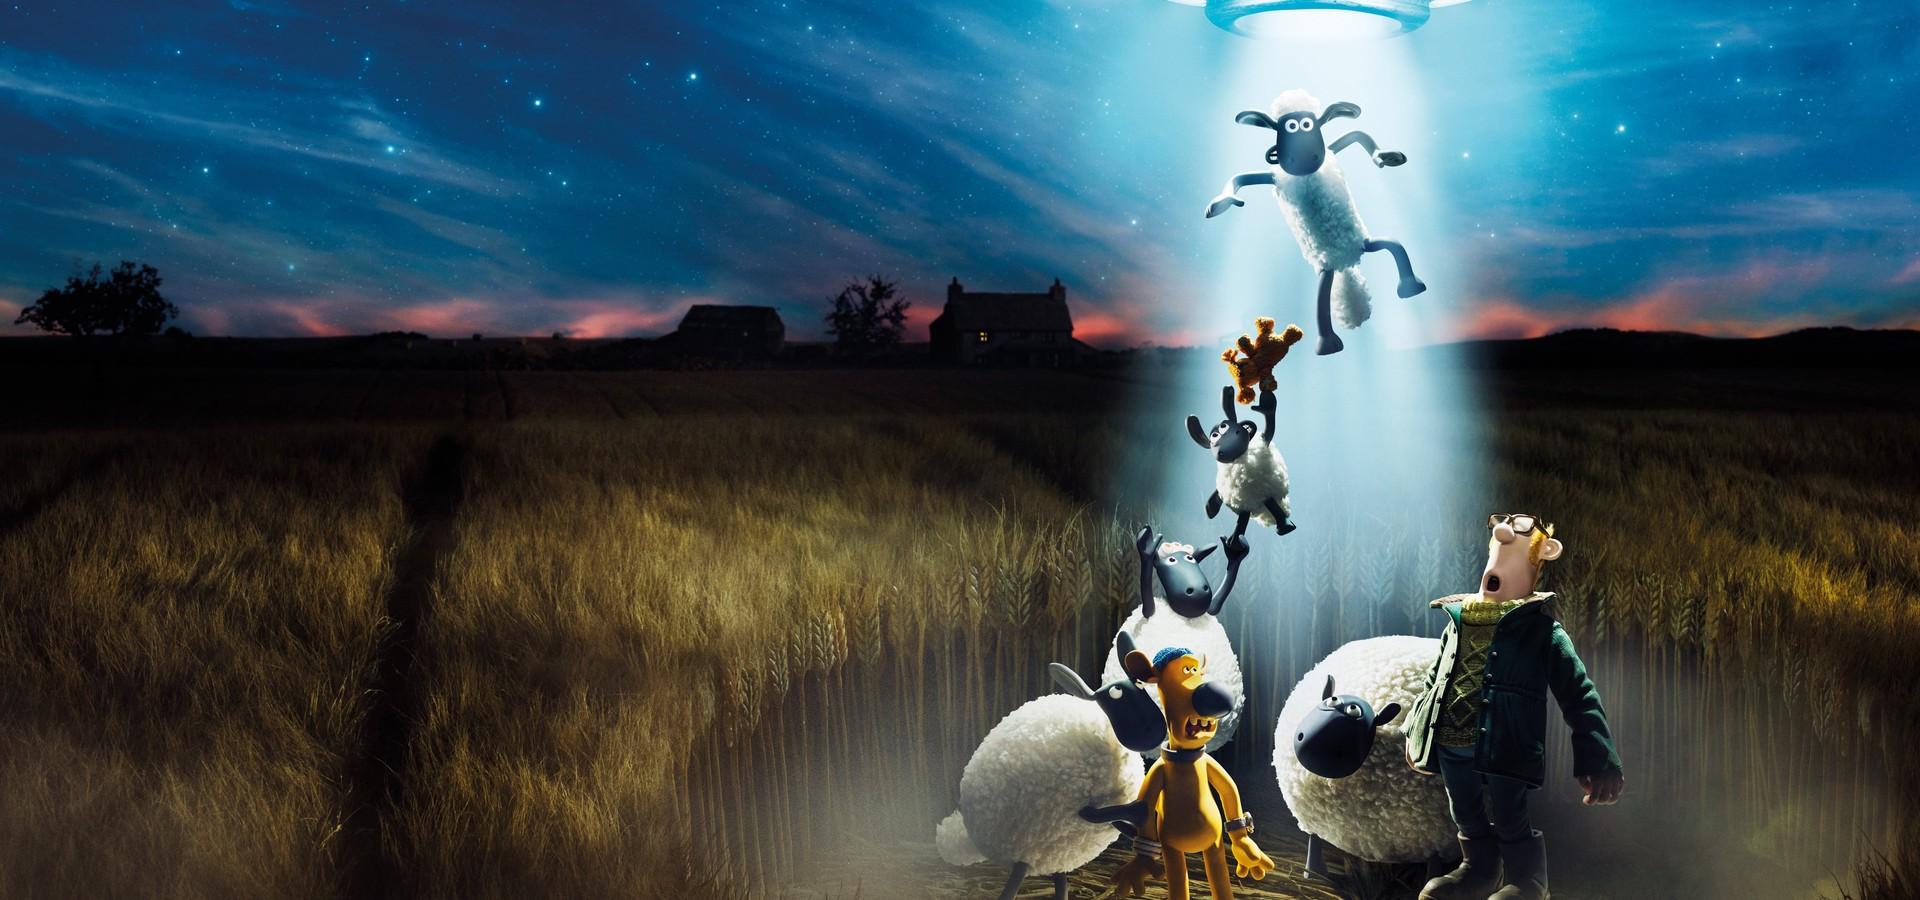 La oveja Shaun, la película Granjaguedón